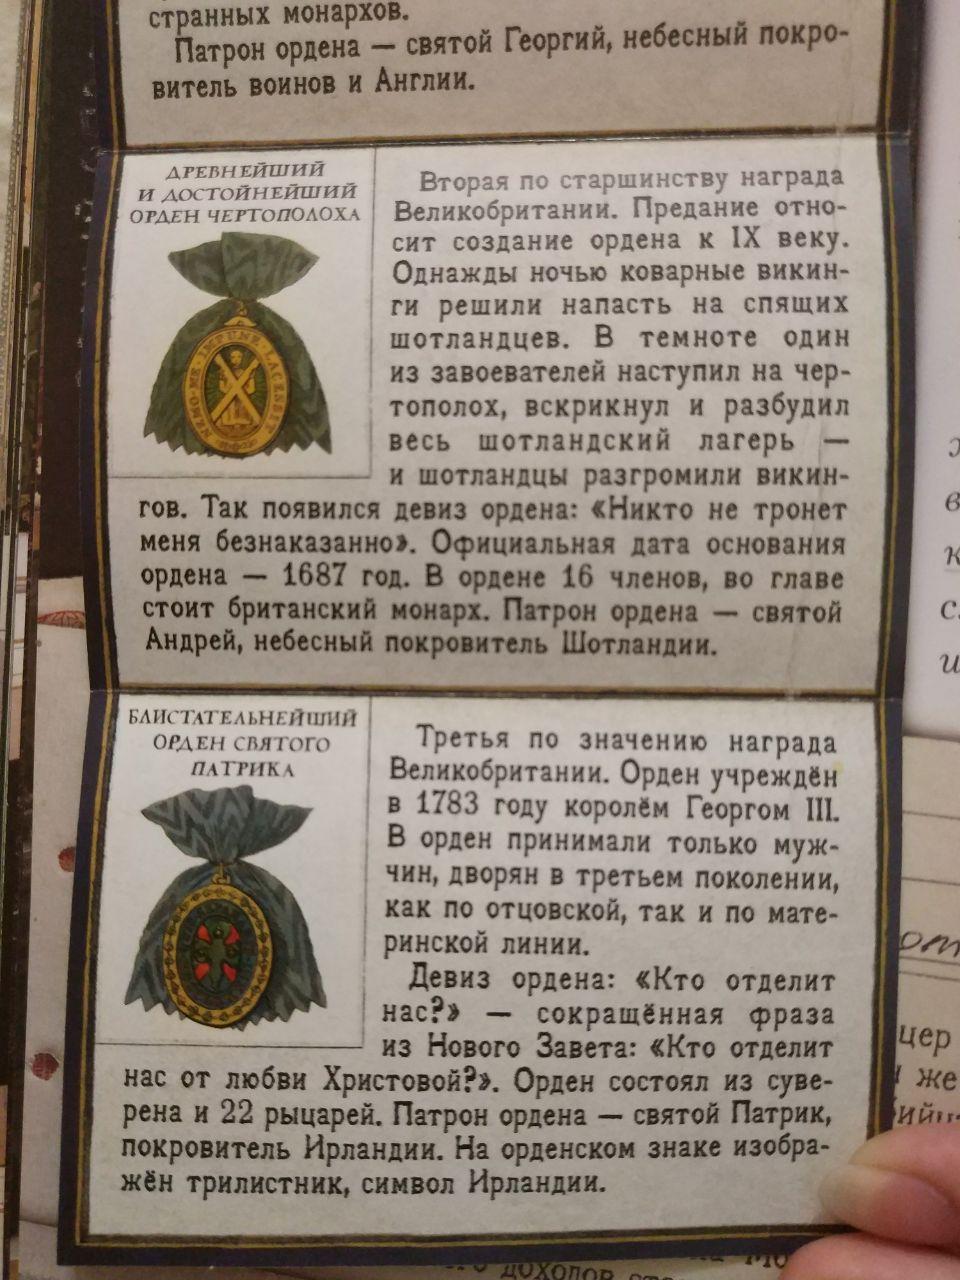 http://s3.uploads.ru/ugFN2.jpg